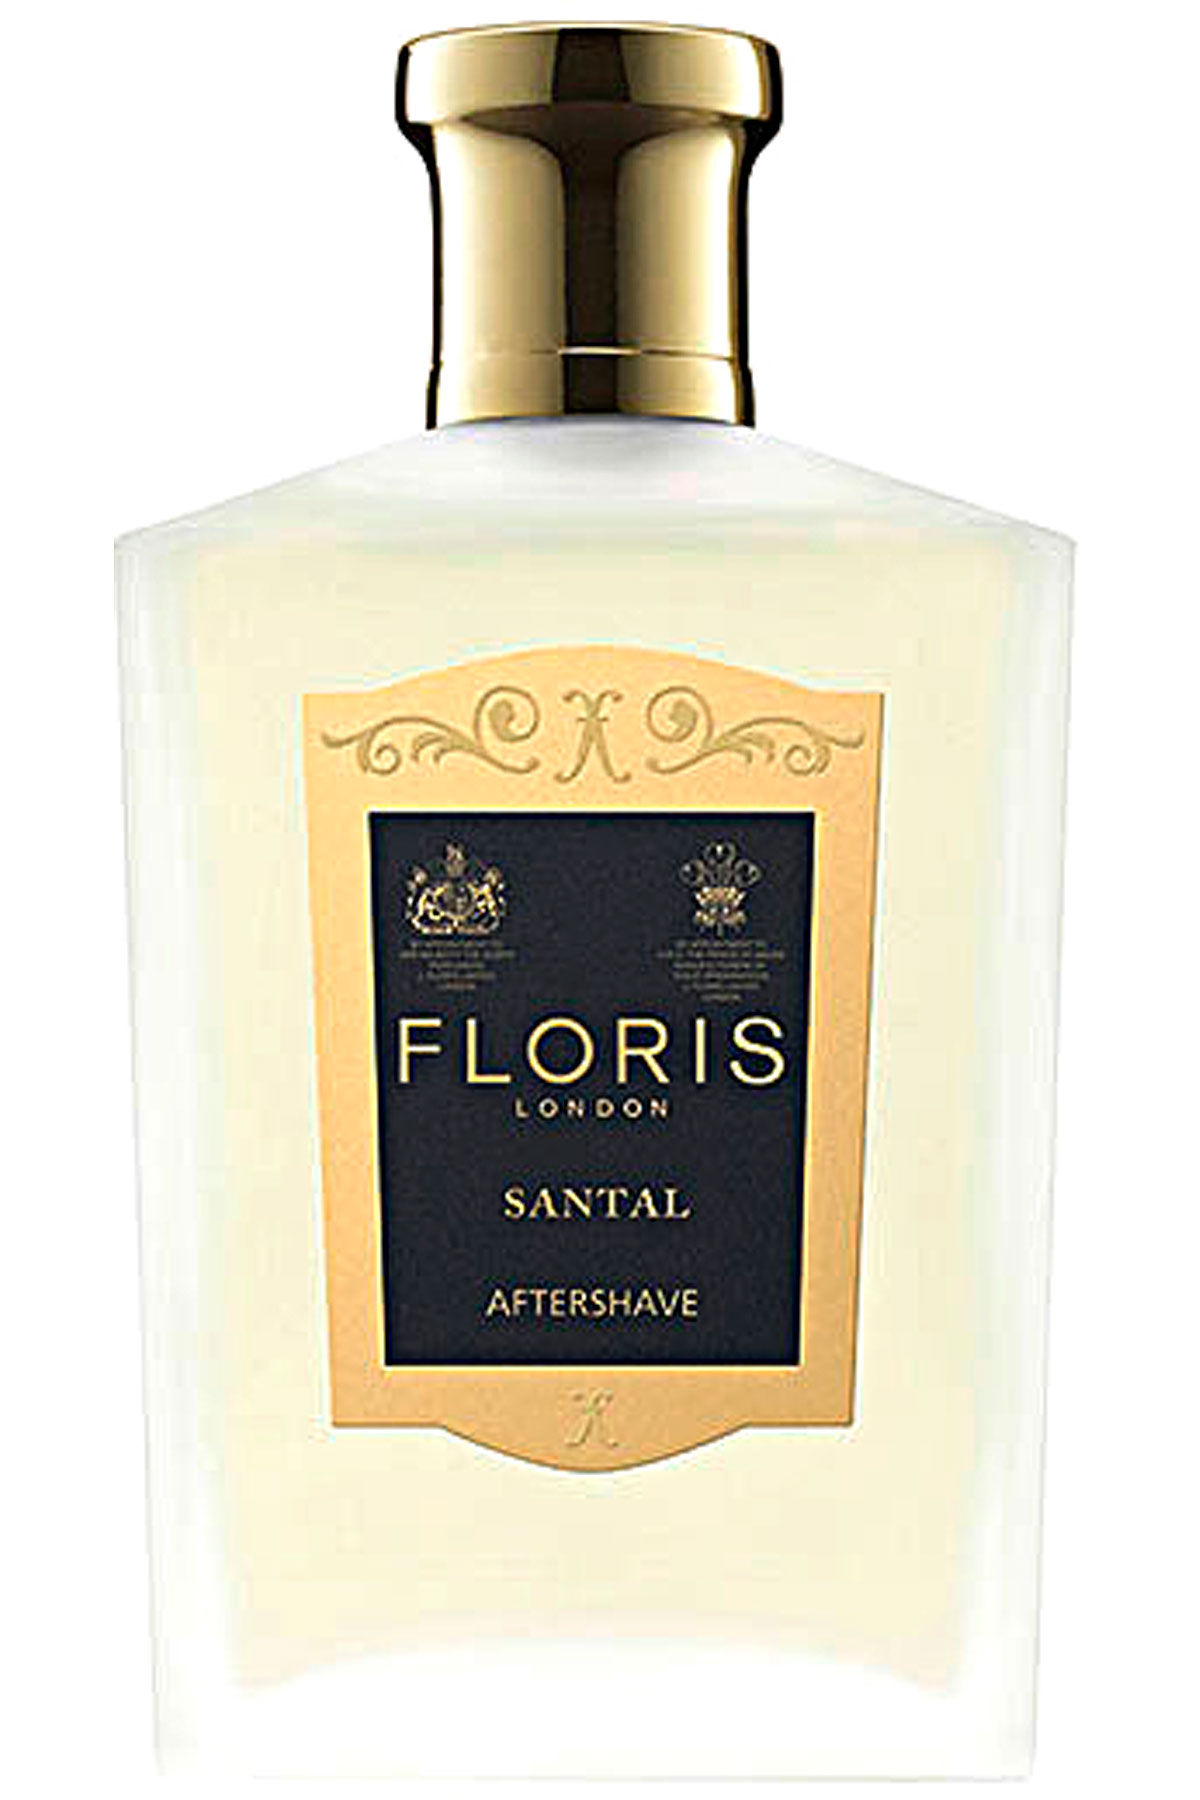 Floris London Shave for Men On Sale, Santal - Aftershave - 100 Ml, 2019, 100 ml